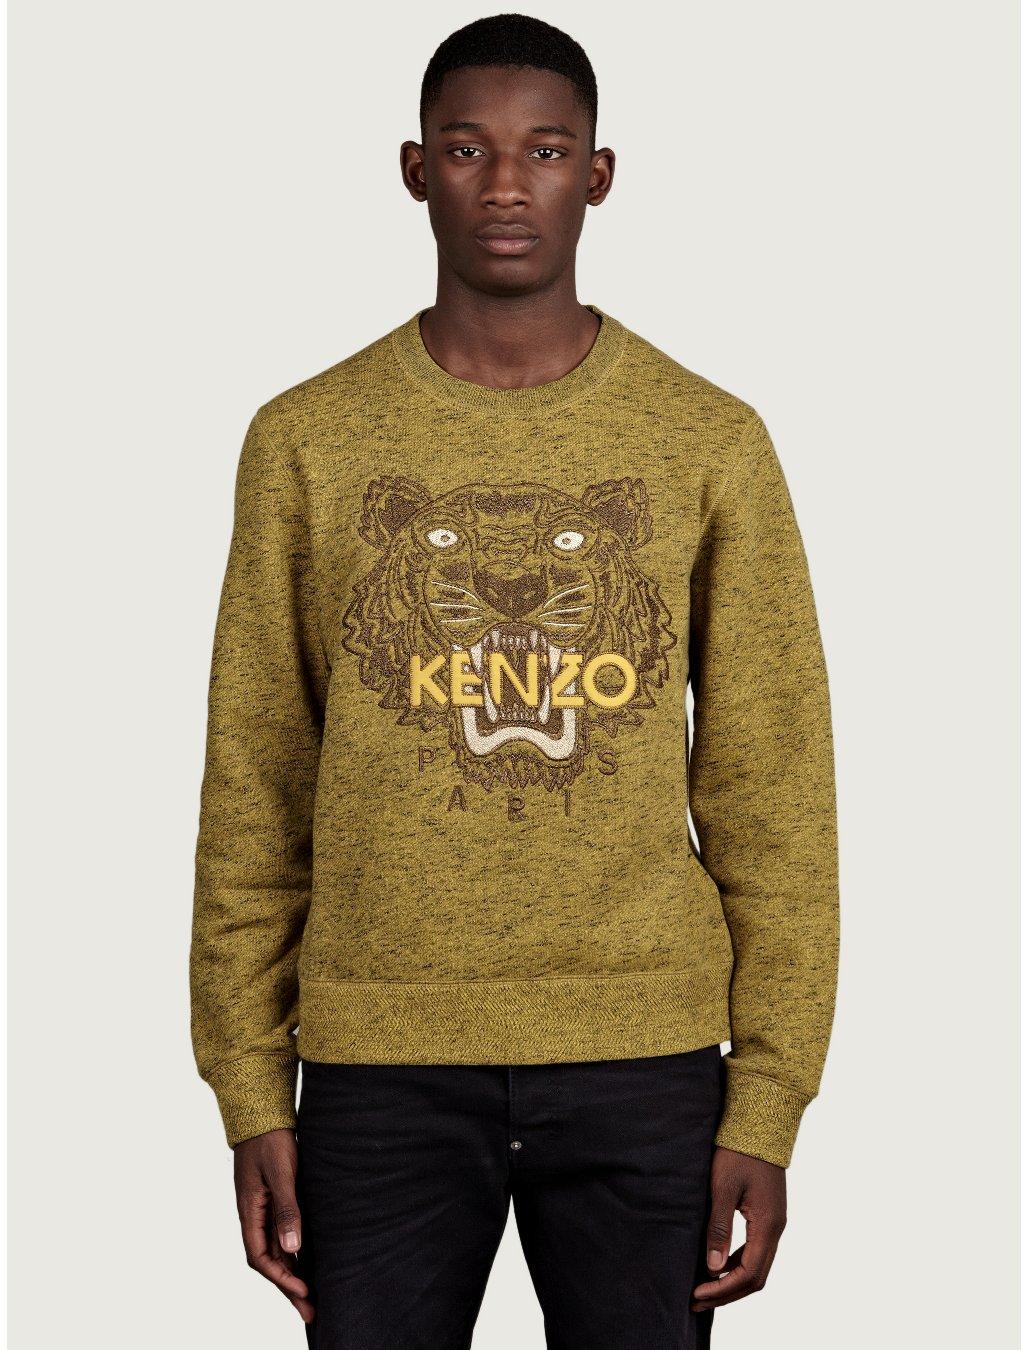 Mens Christmas Cardigan Sweater